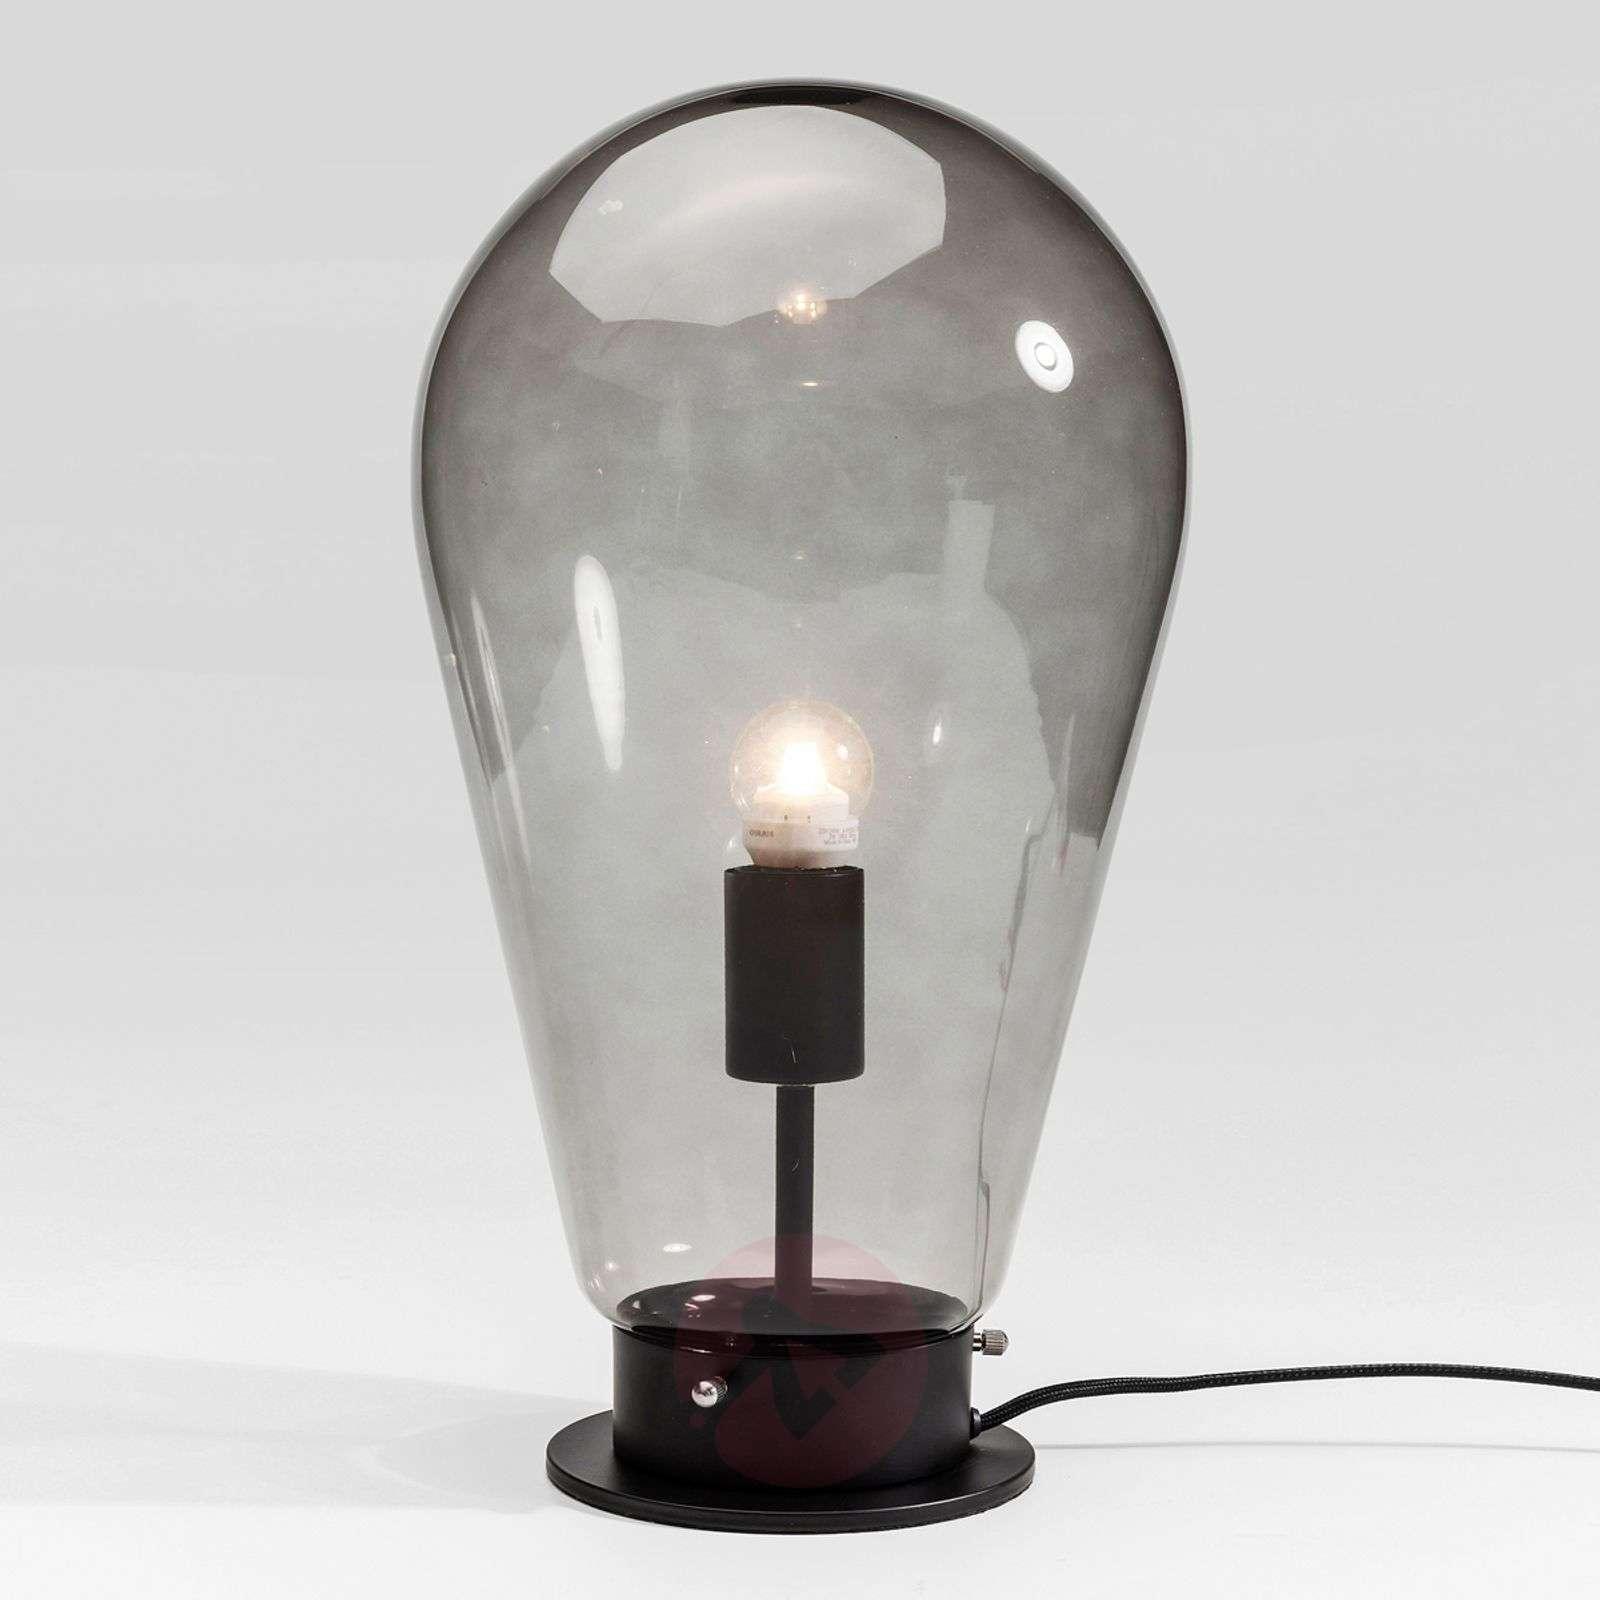 KARE Bulb grey glass table lamp-5517511-01